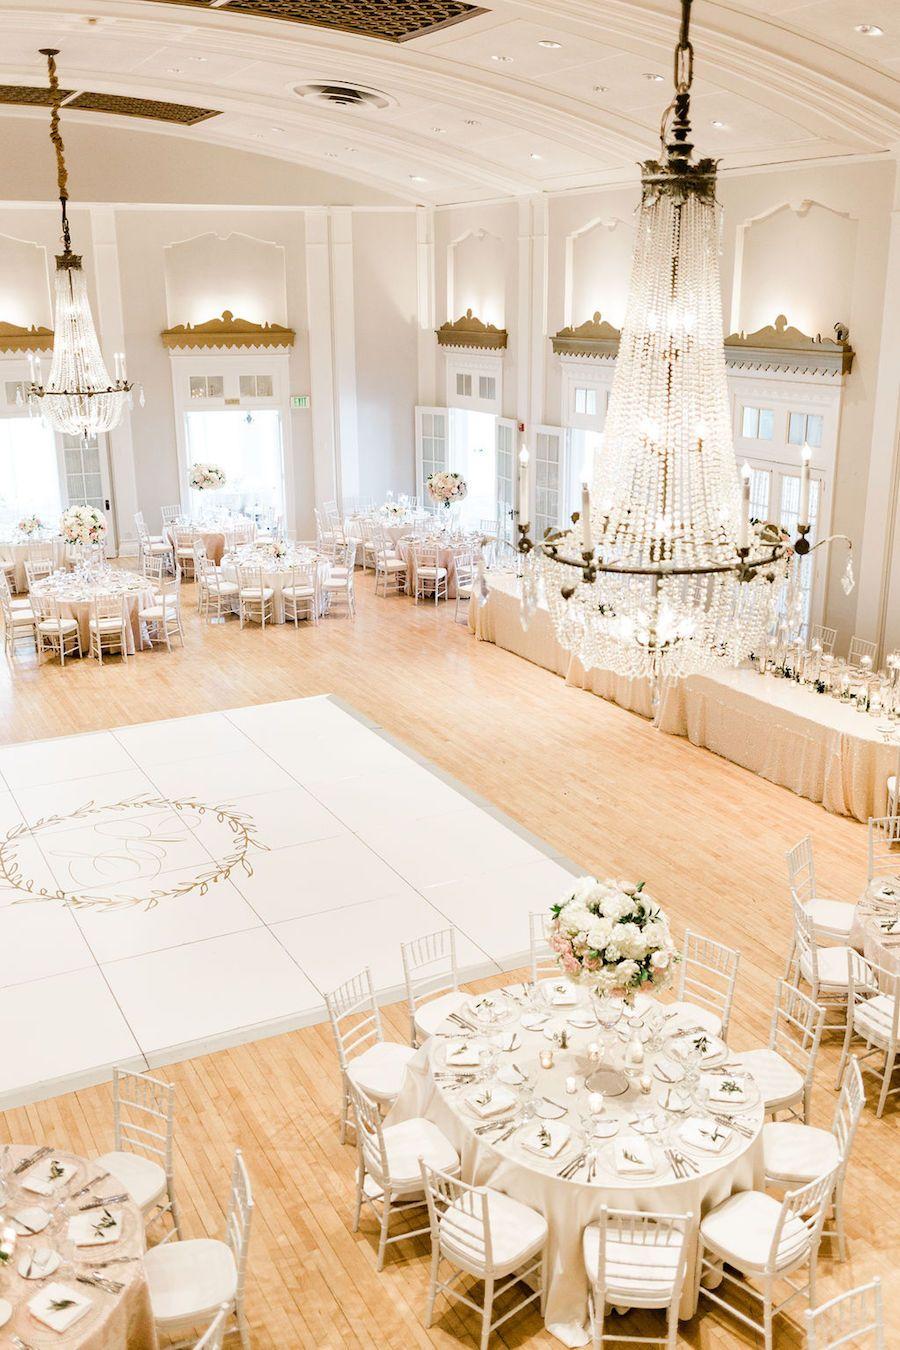 Dreamy Classic White Country Club Wedding with Ballroom Elegance - MODwedding